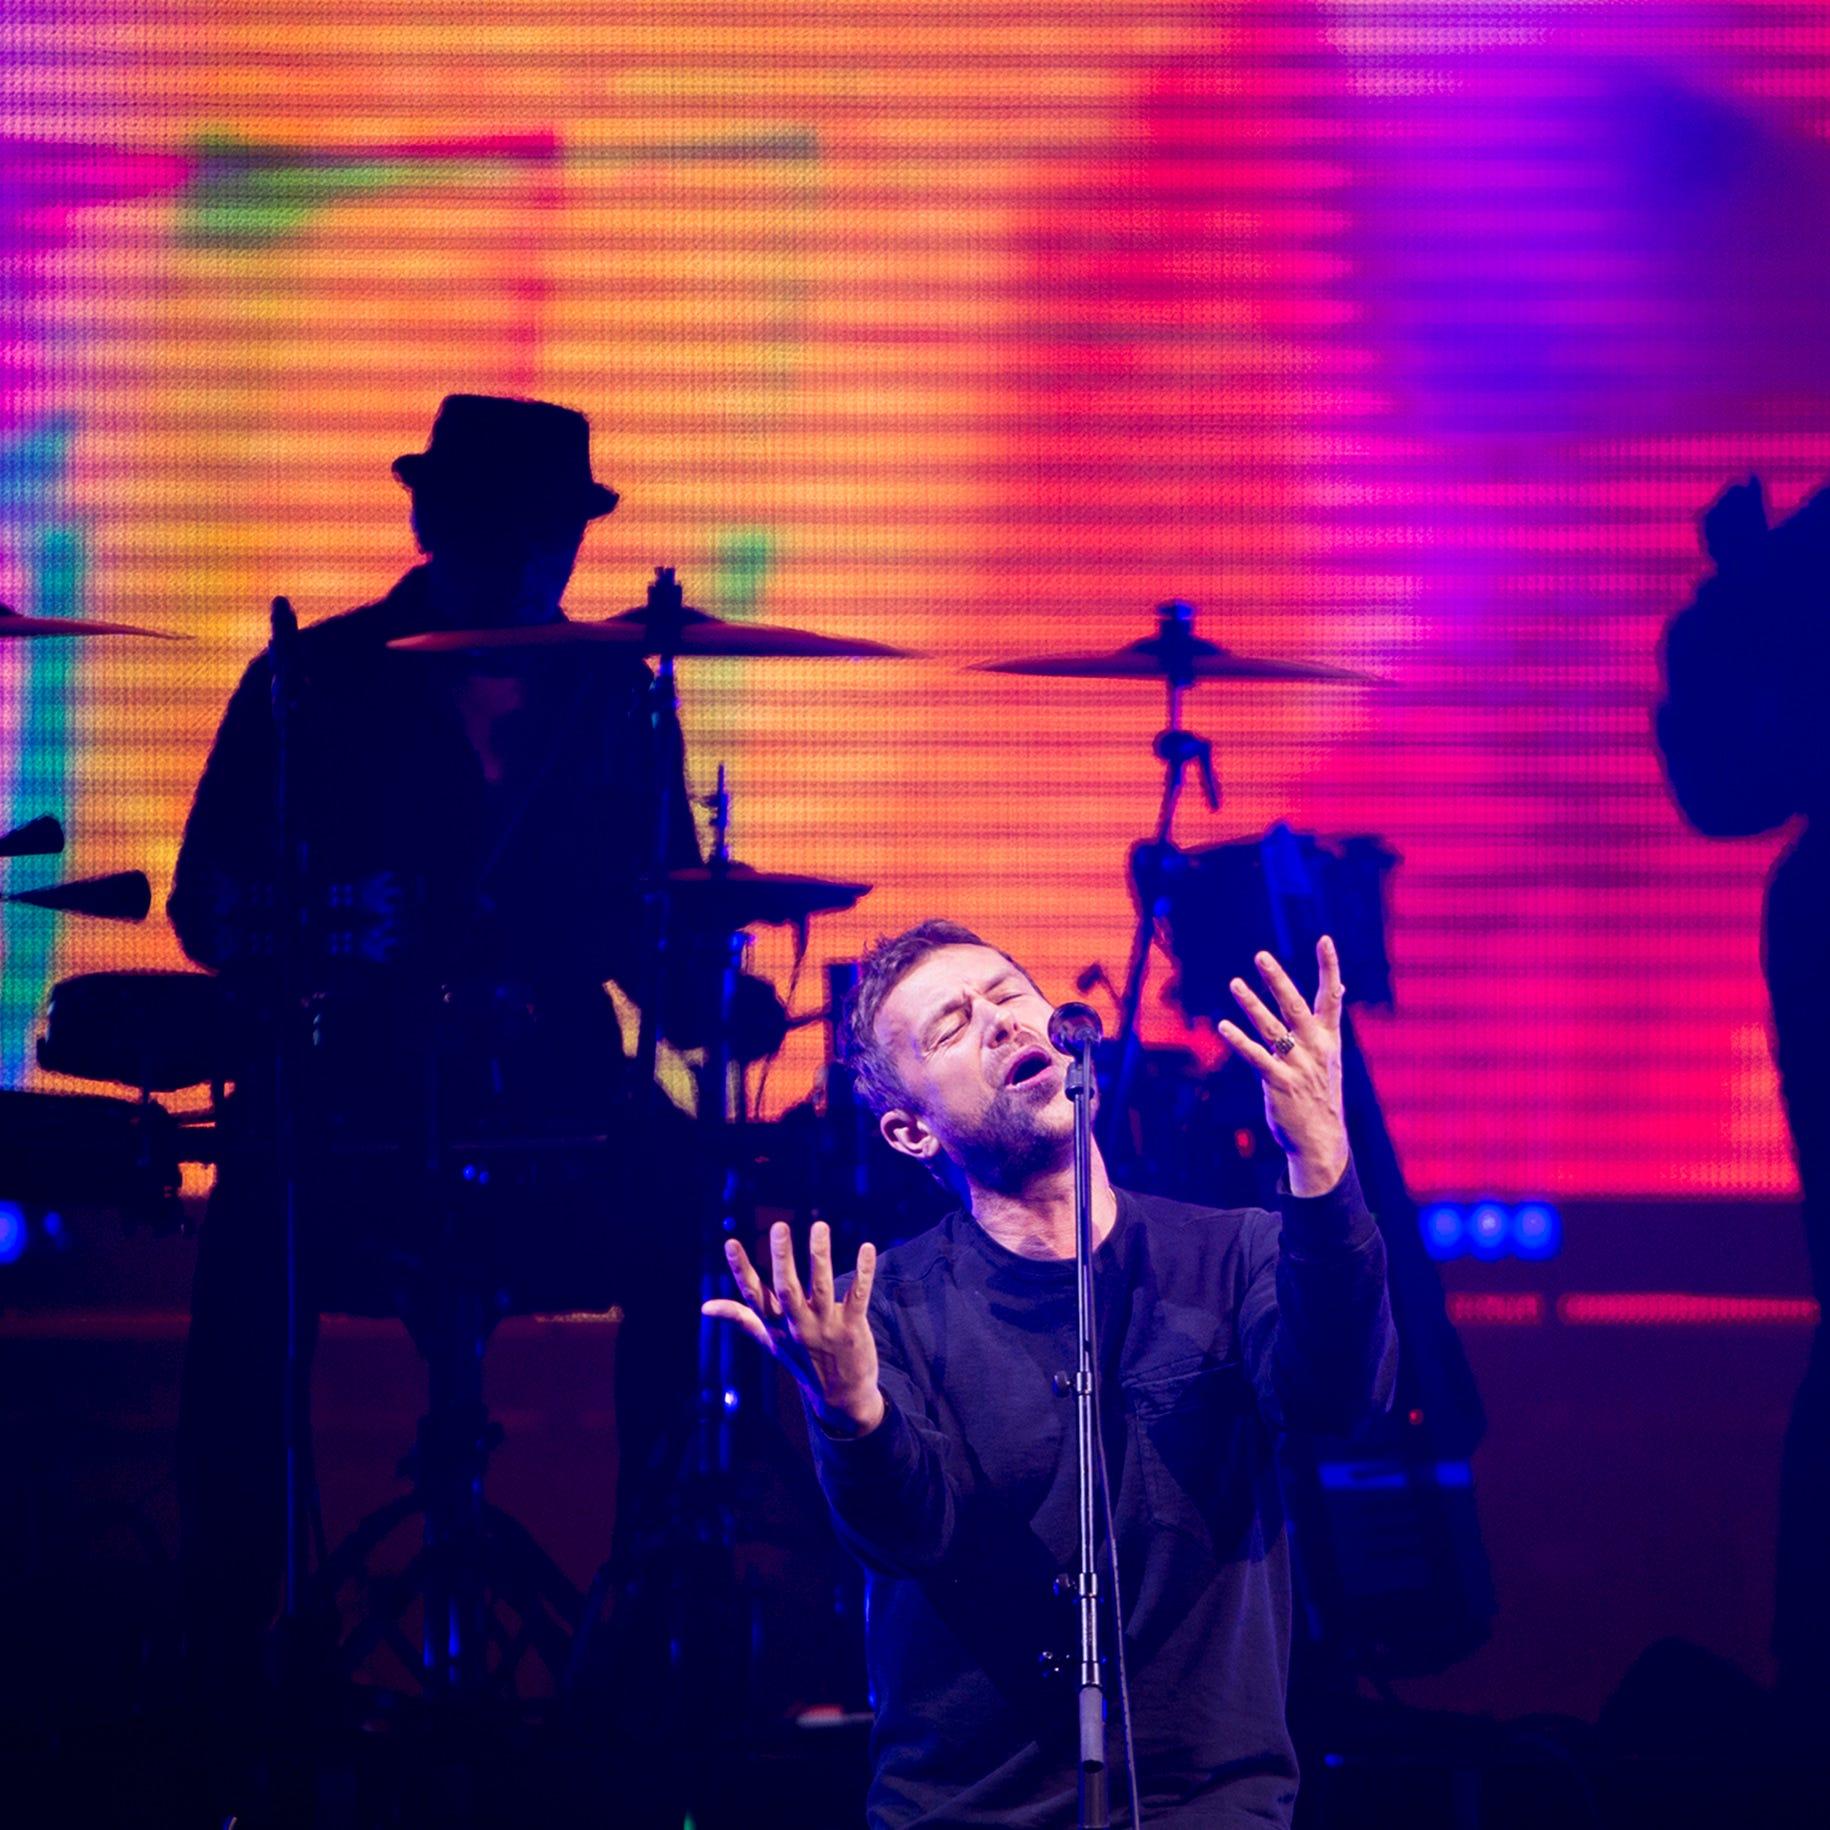 Gorillaz tour: setlist, photos, review of The Now Now in Philadelphia